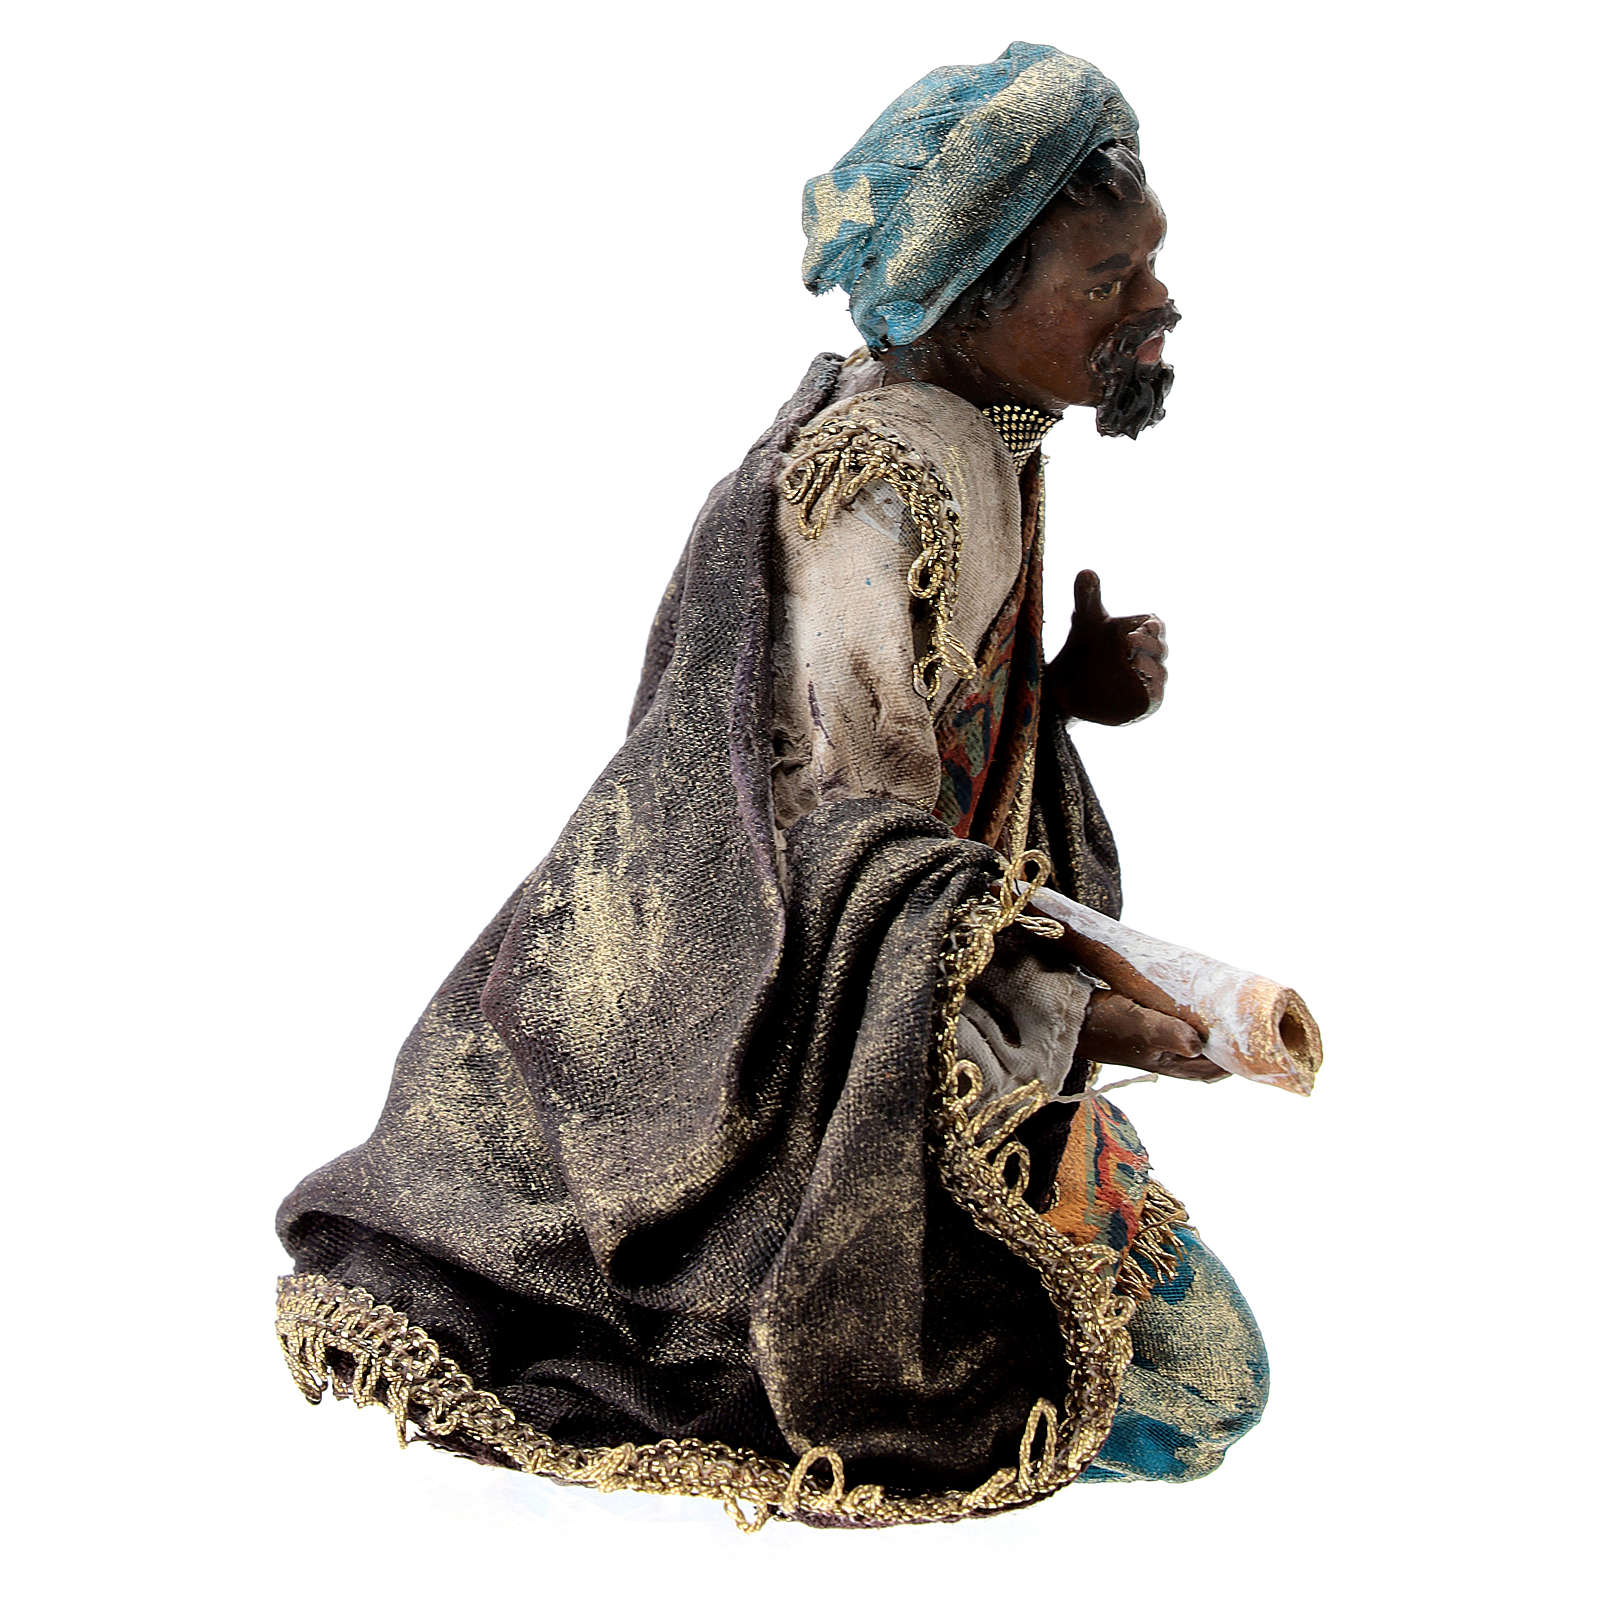 Nativity scene figurine, Dark-skinned King by Angela Tripi 13 cm 4